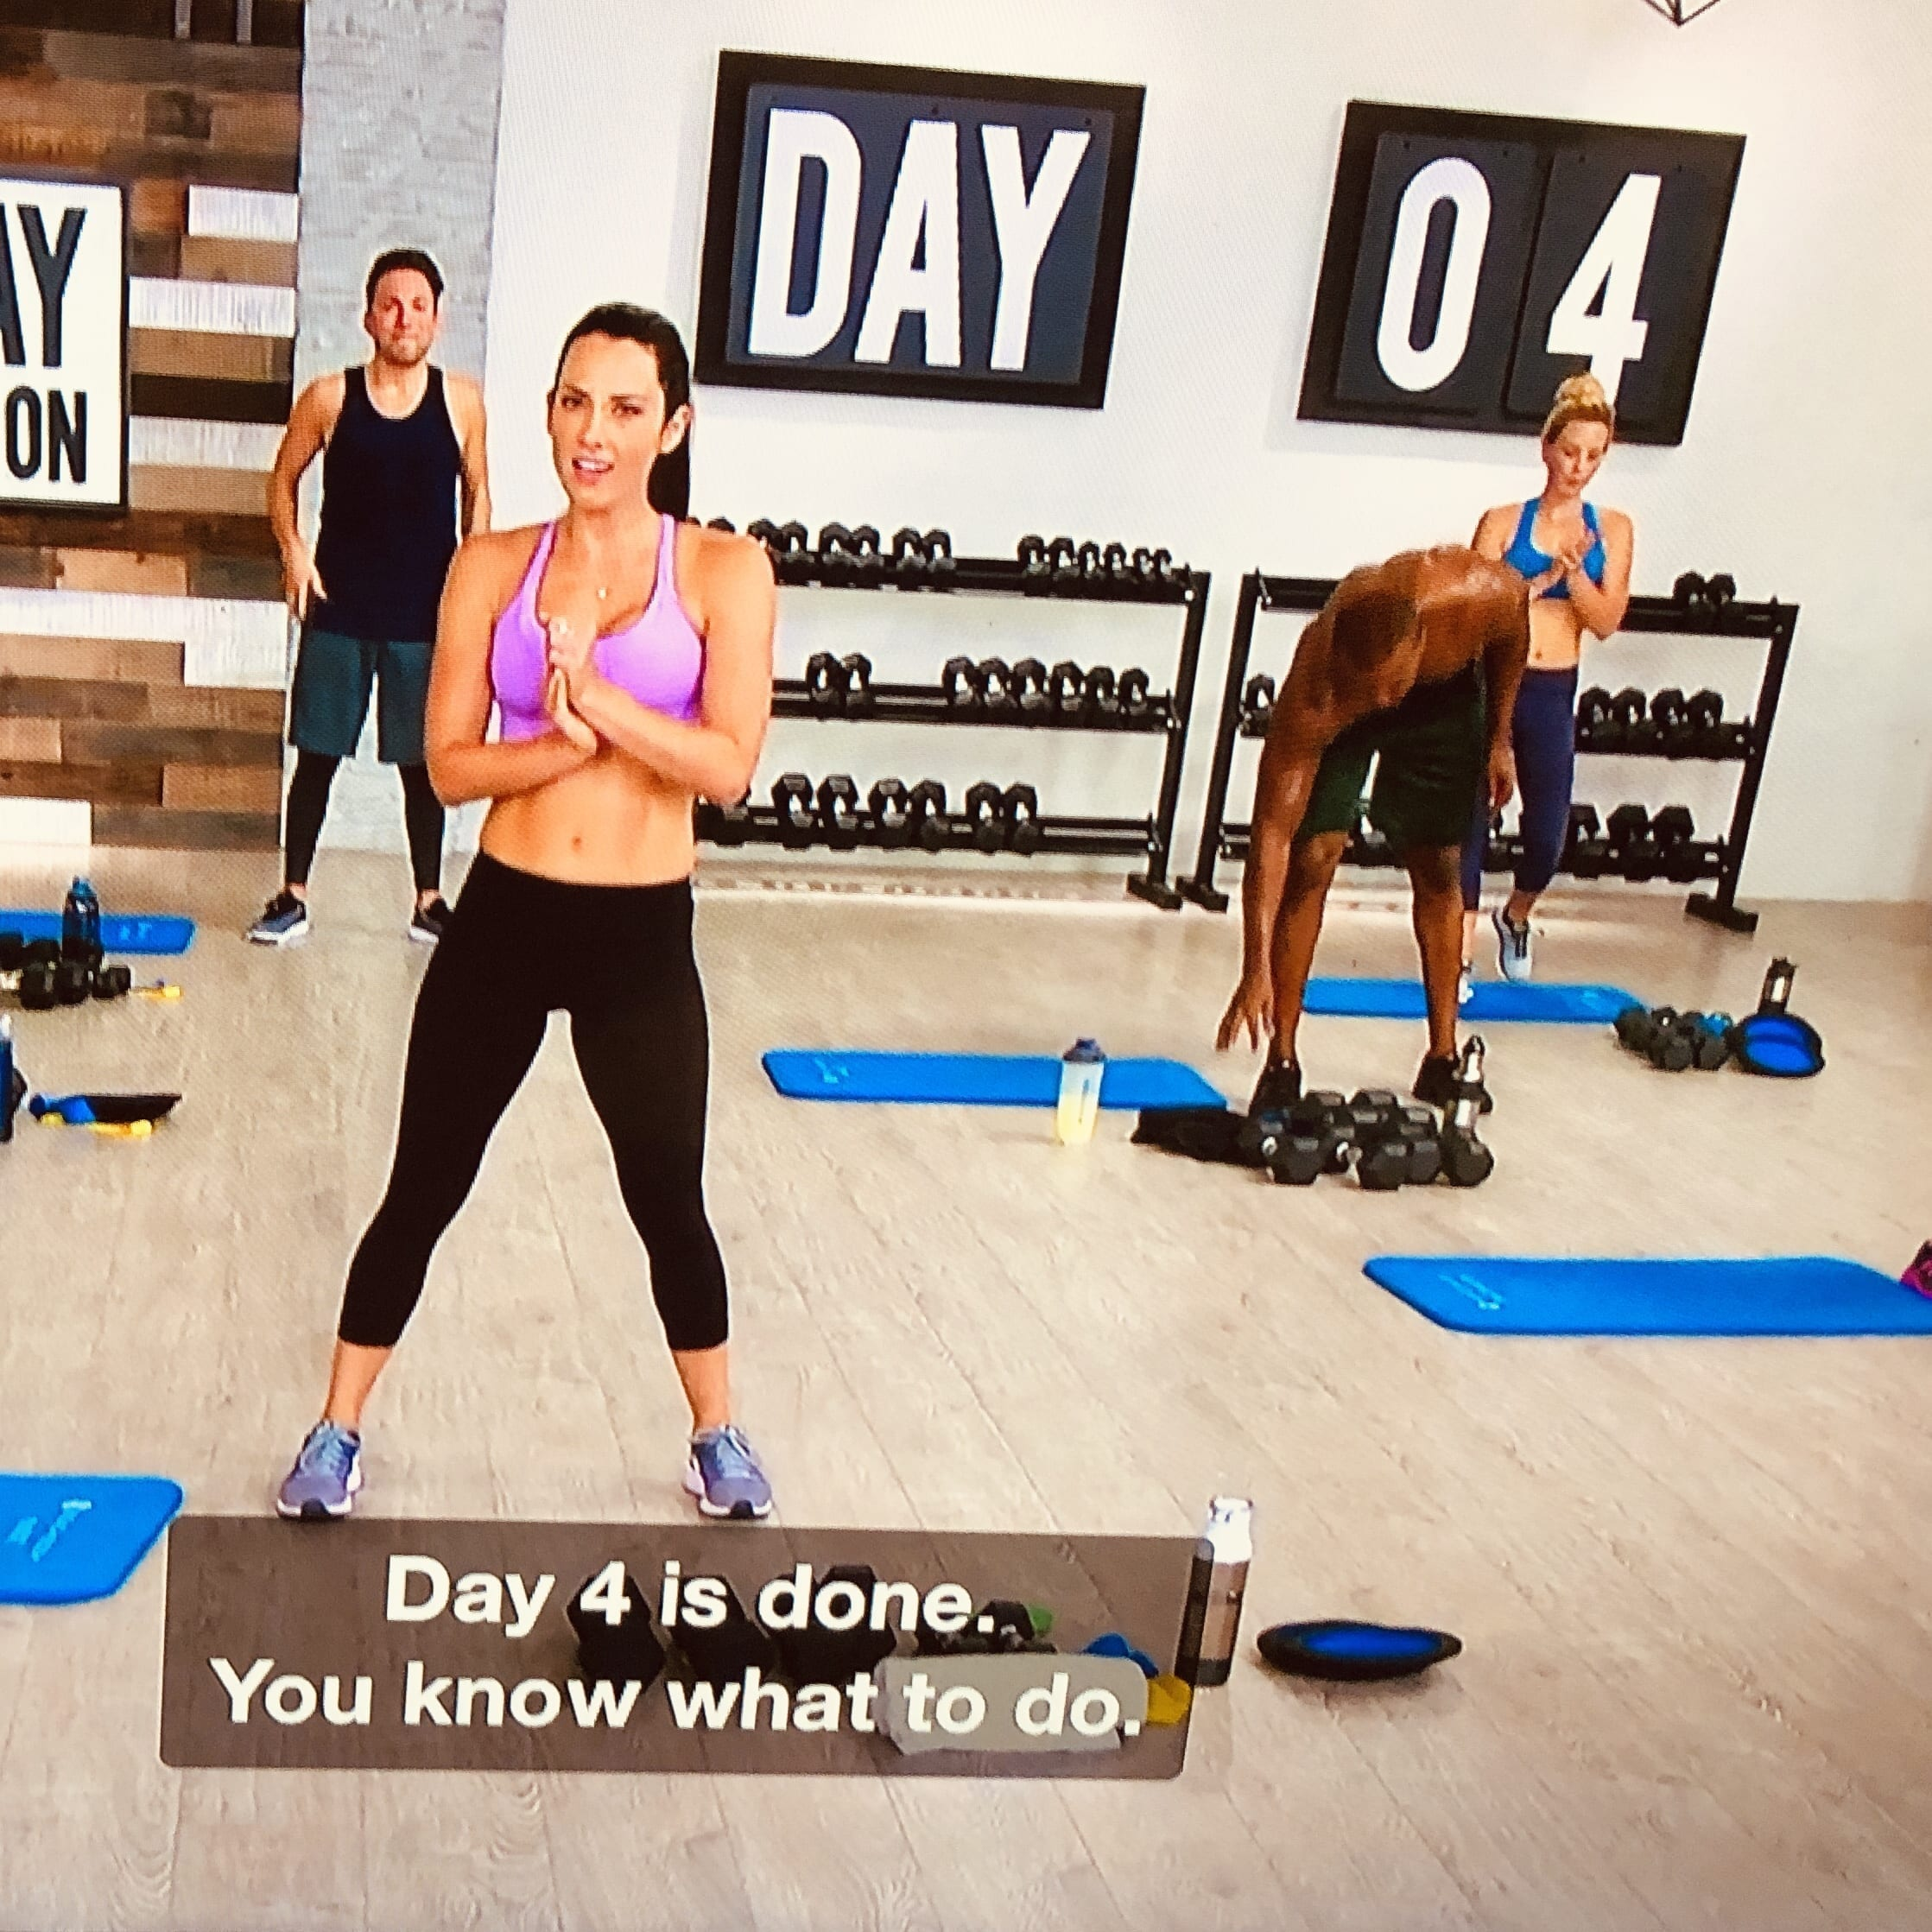 beachbody and captions- best deaf friendly fitness programs